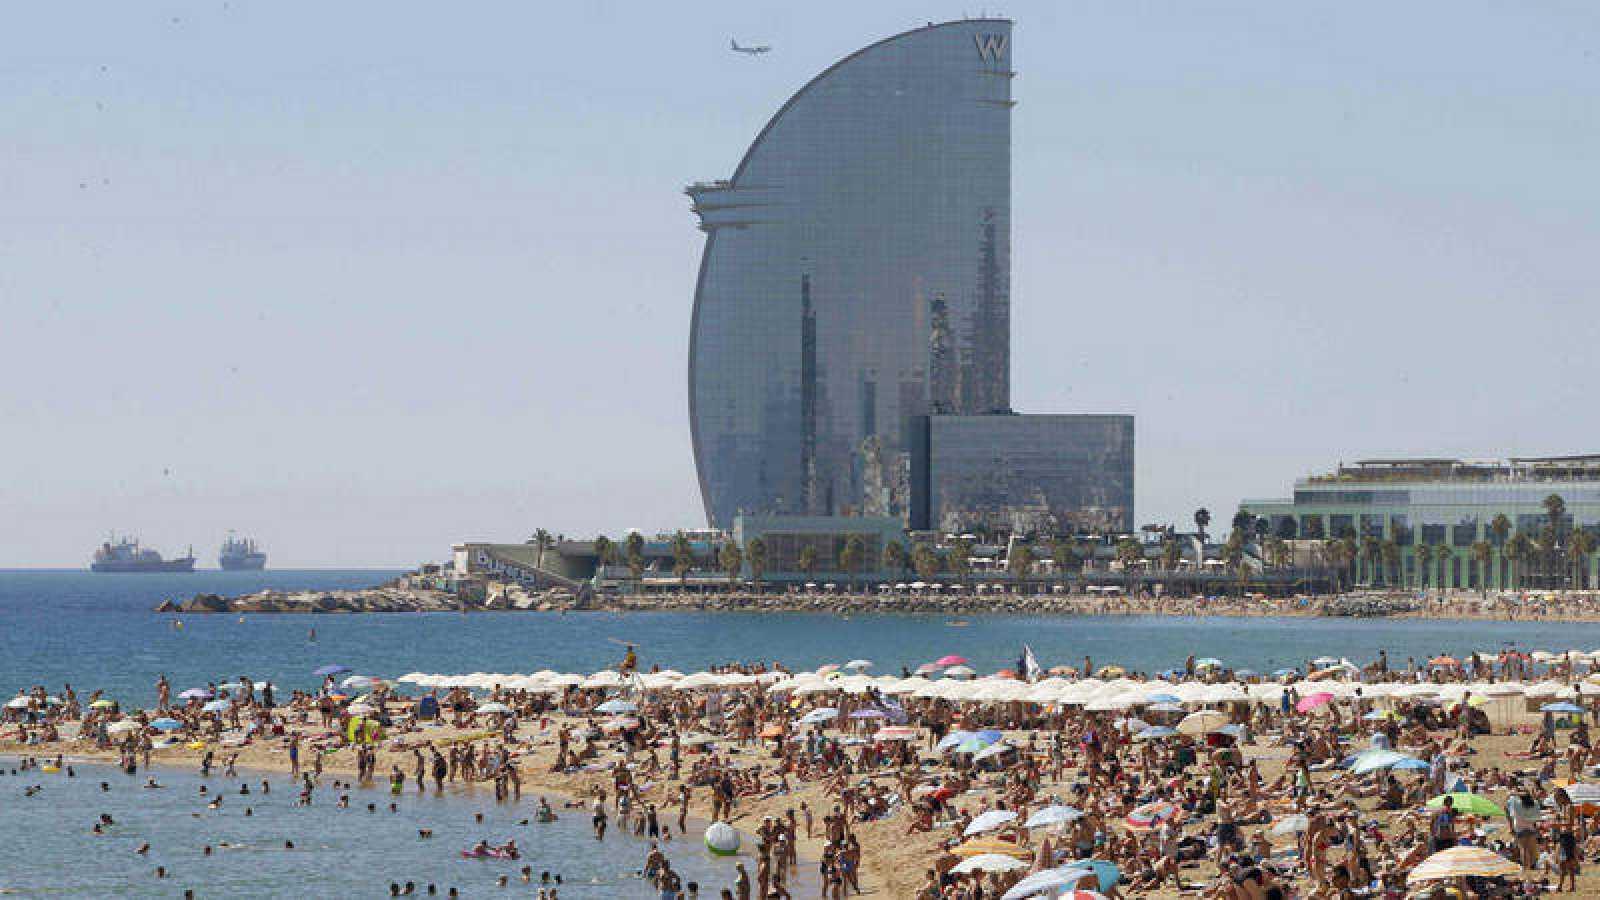 Vista de un hotel junto a la playa de la Barceloneta (Barcelona).